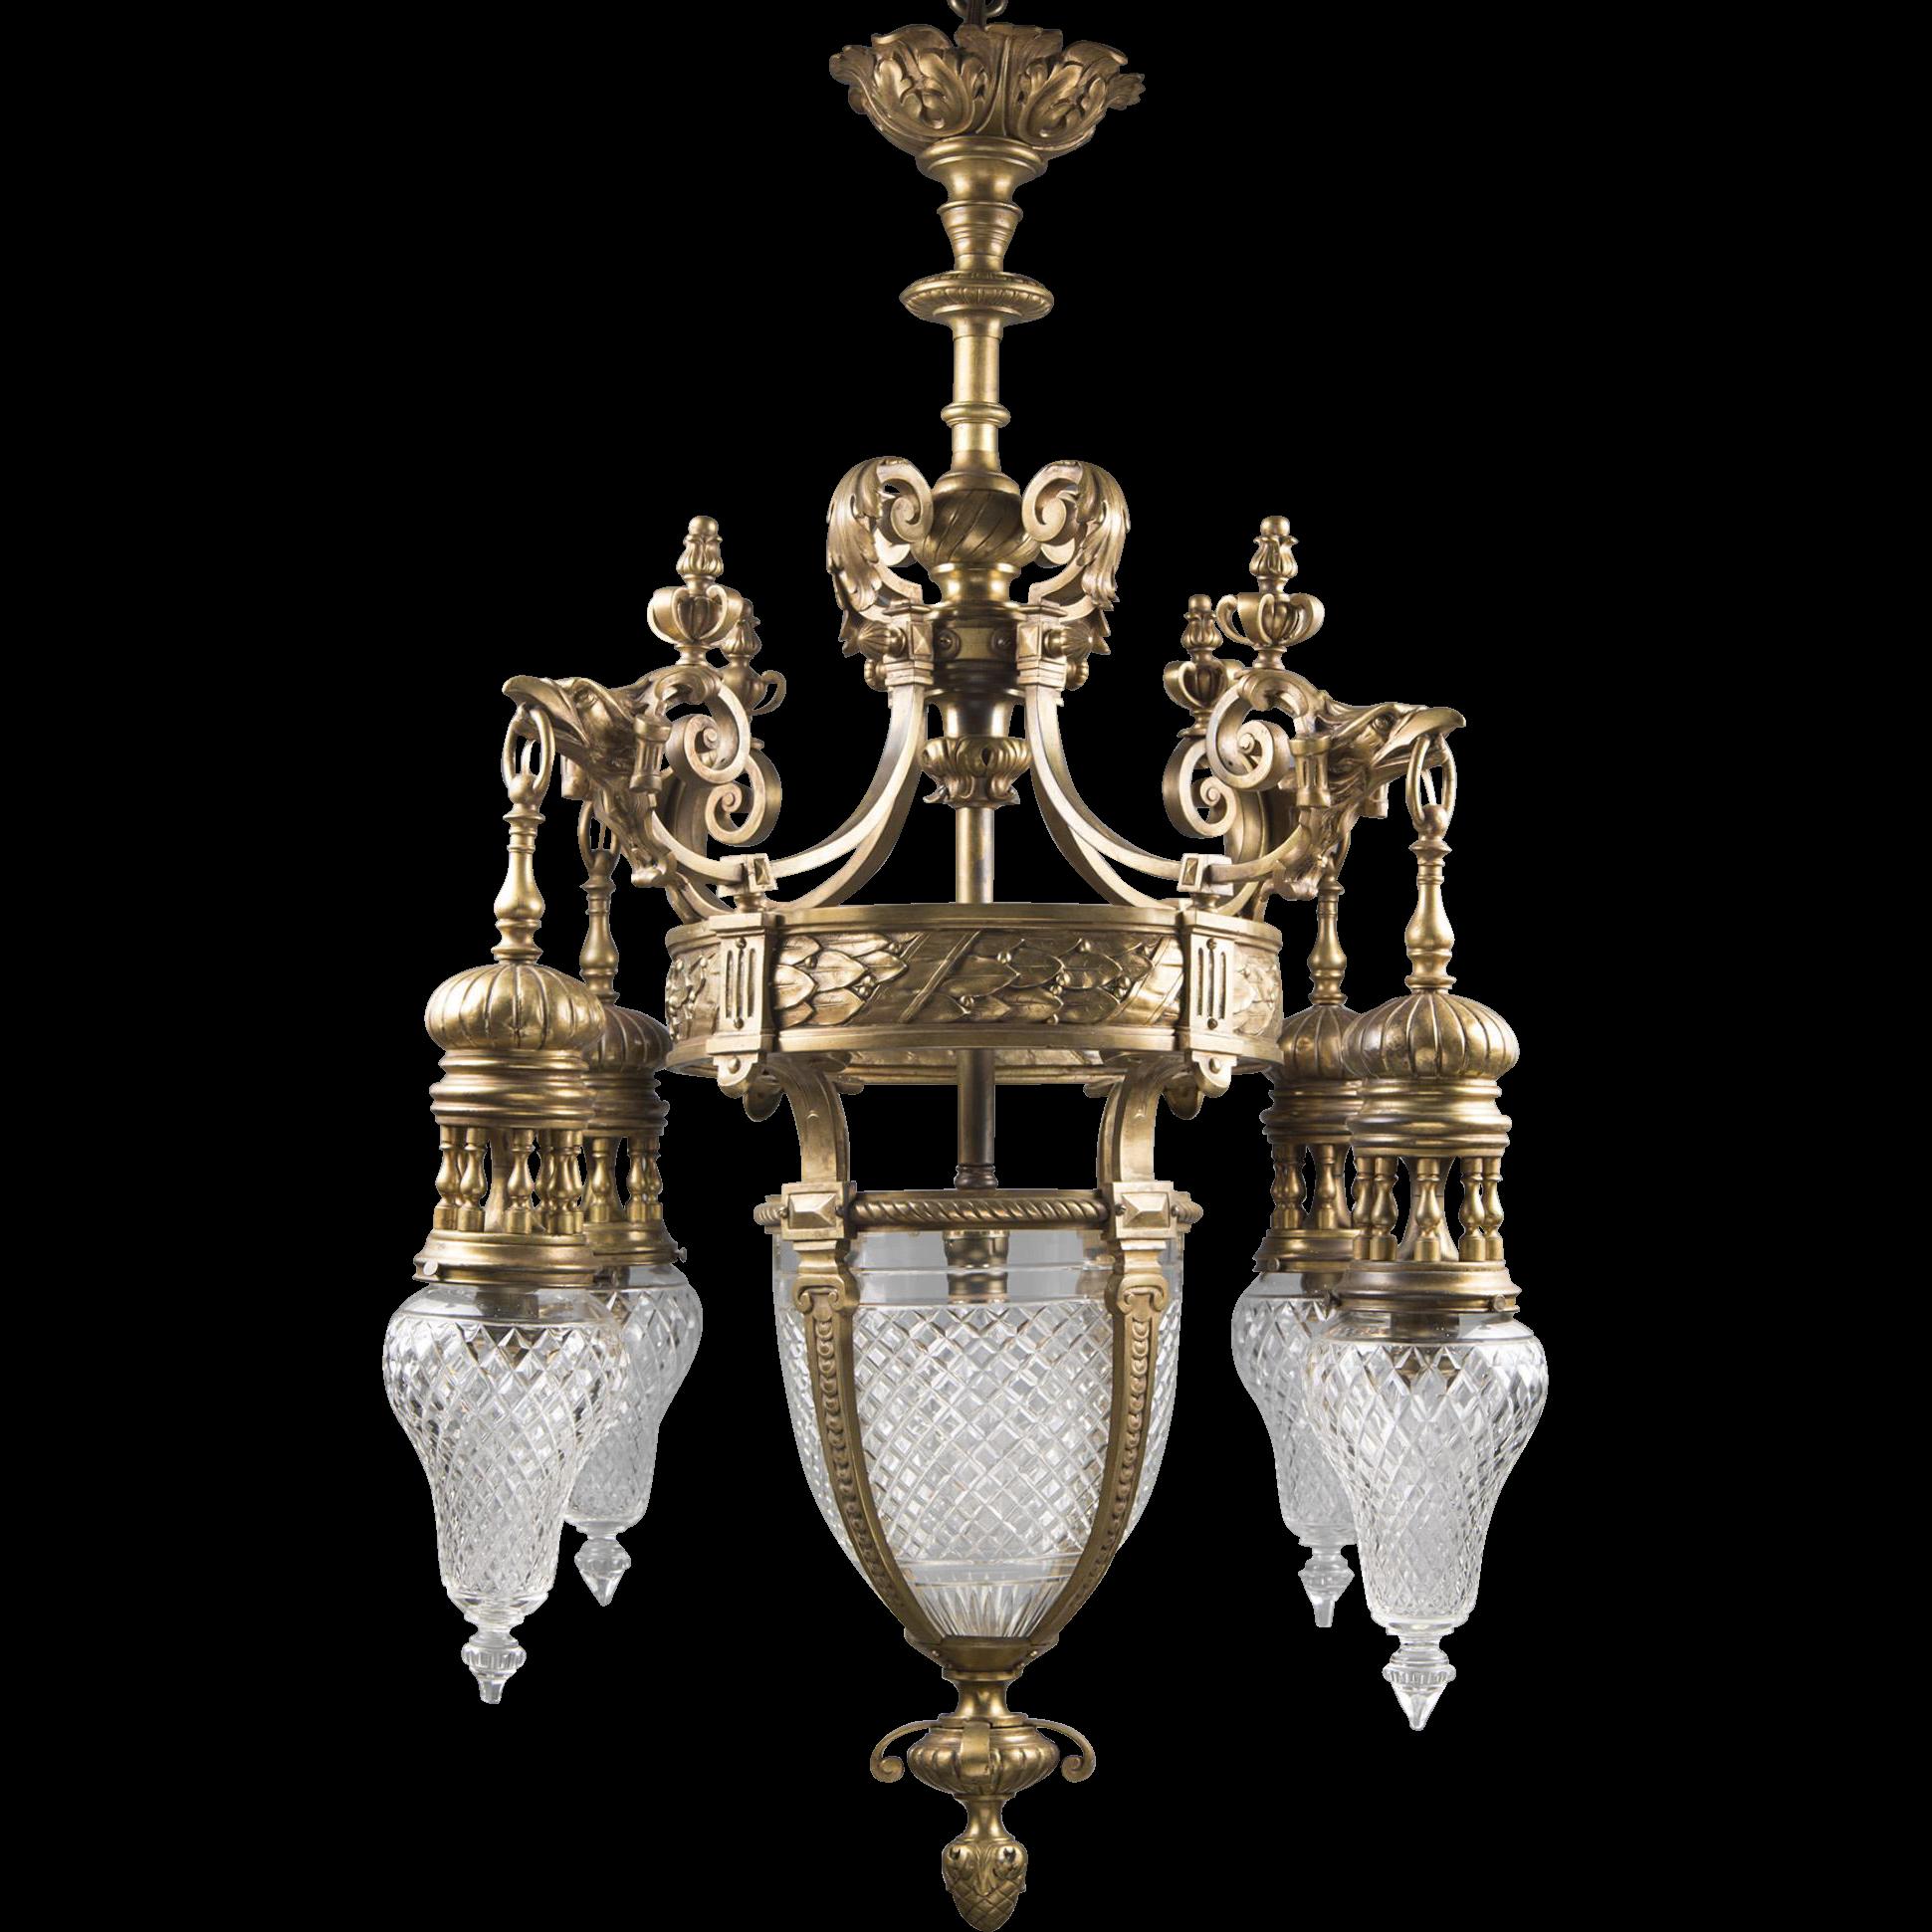 Early 20th C. French Cut Crystal Bronze Lantern Chandelier